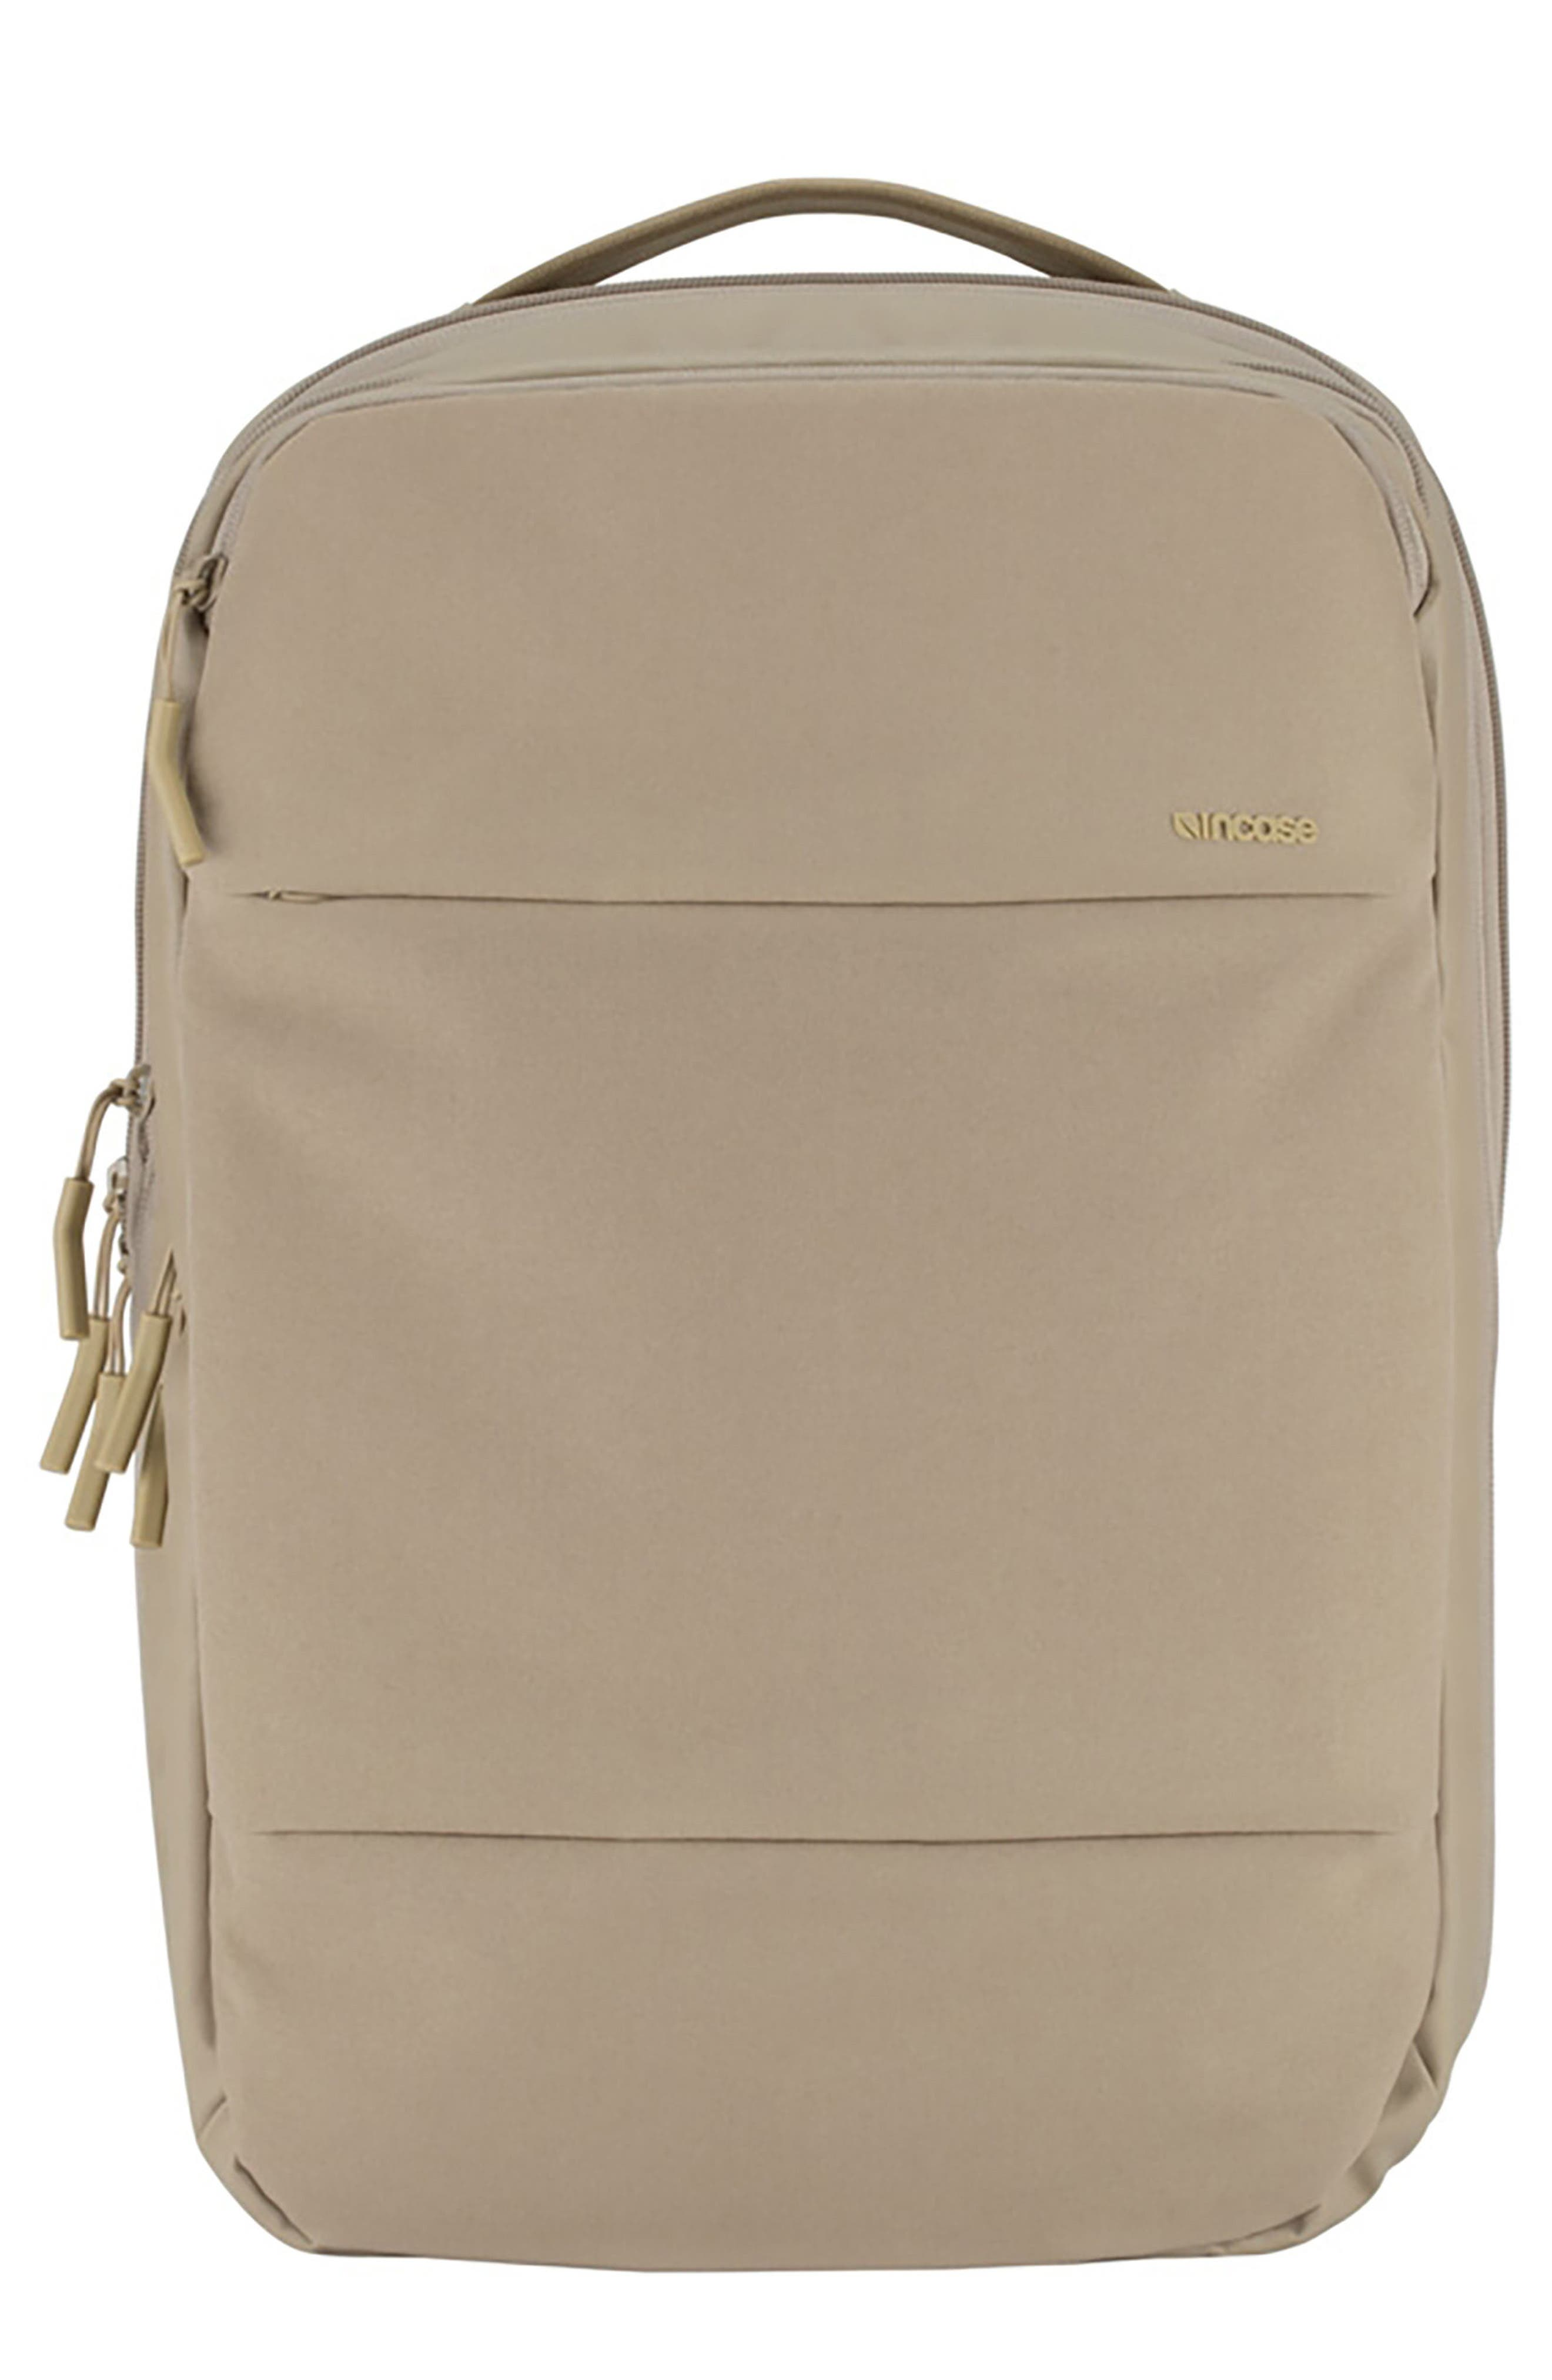 Incase Designs City Commuter Backpack